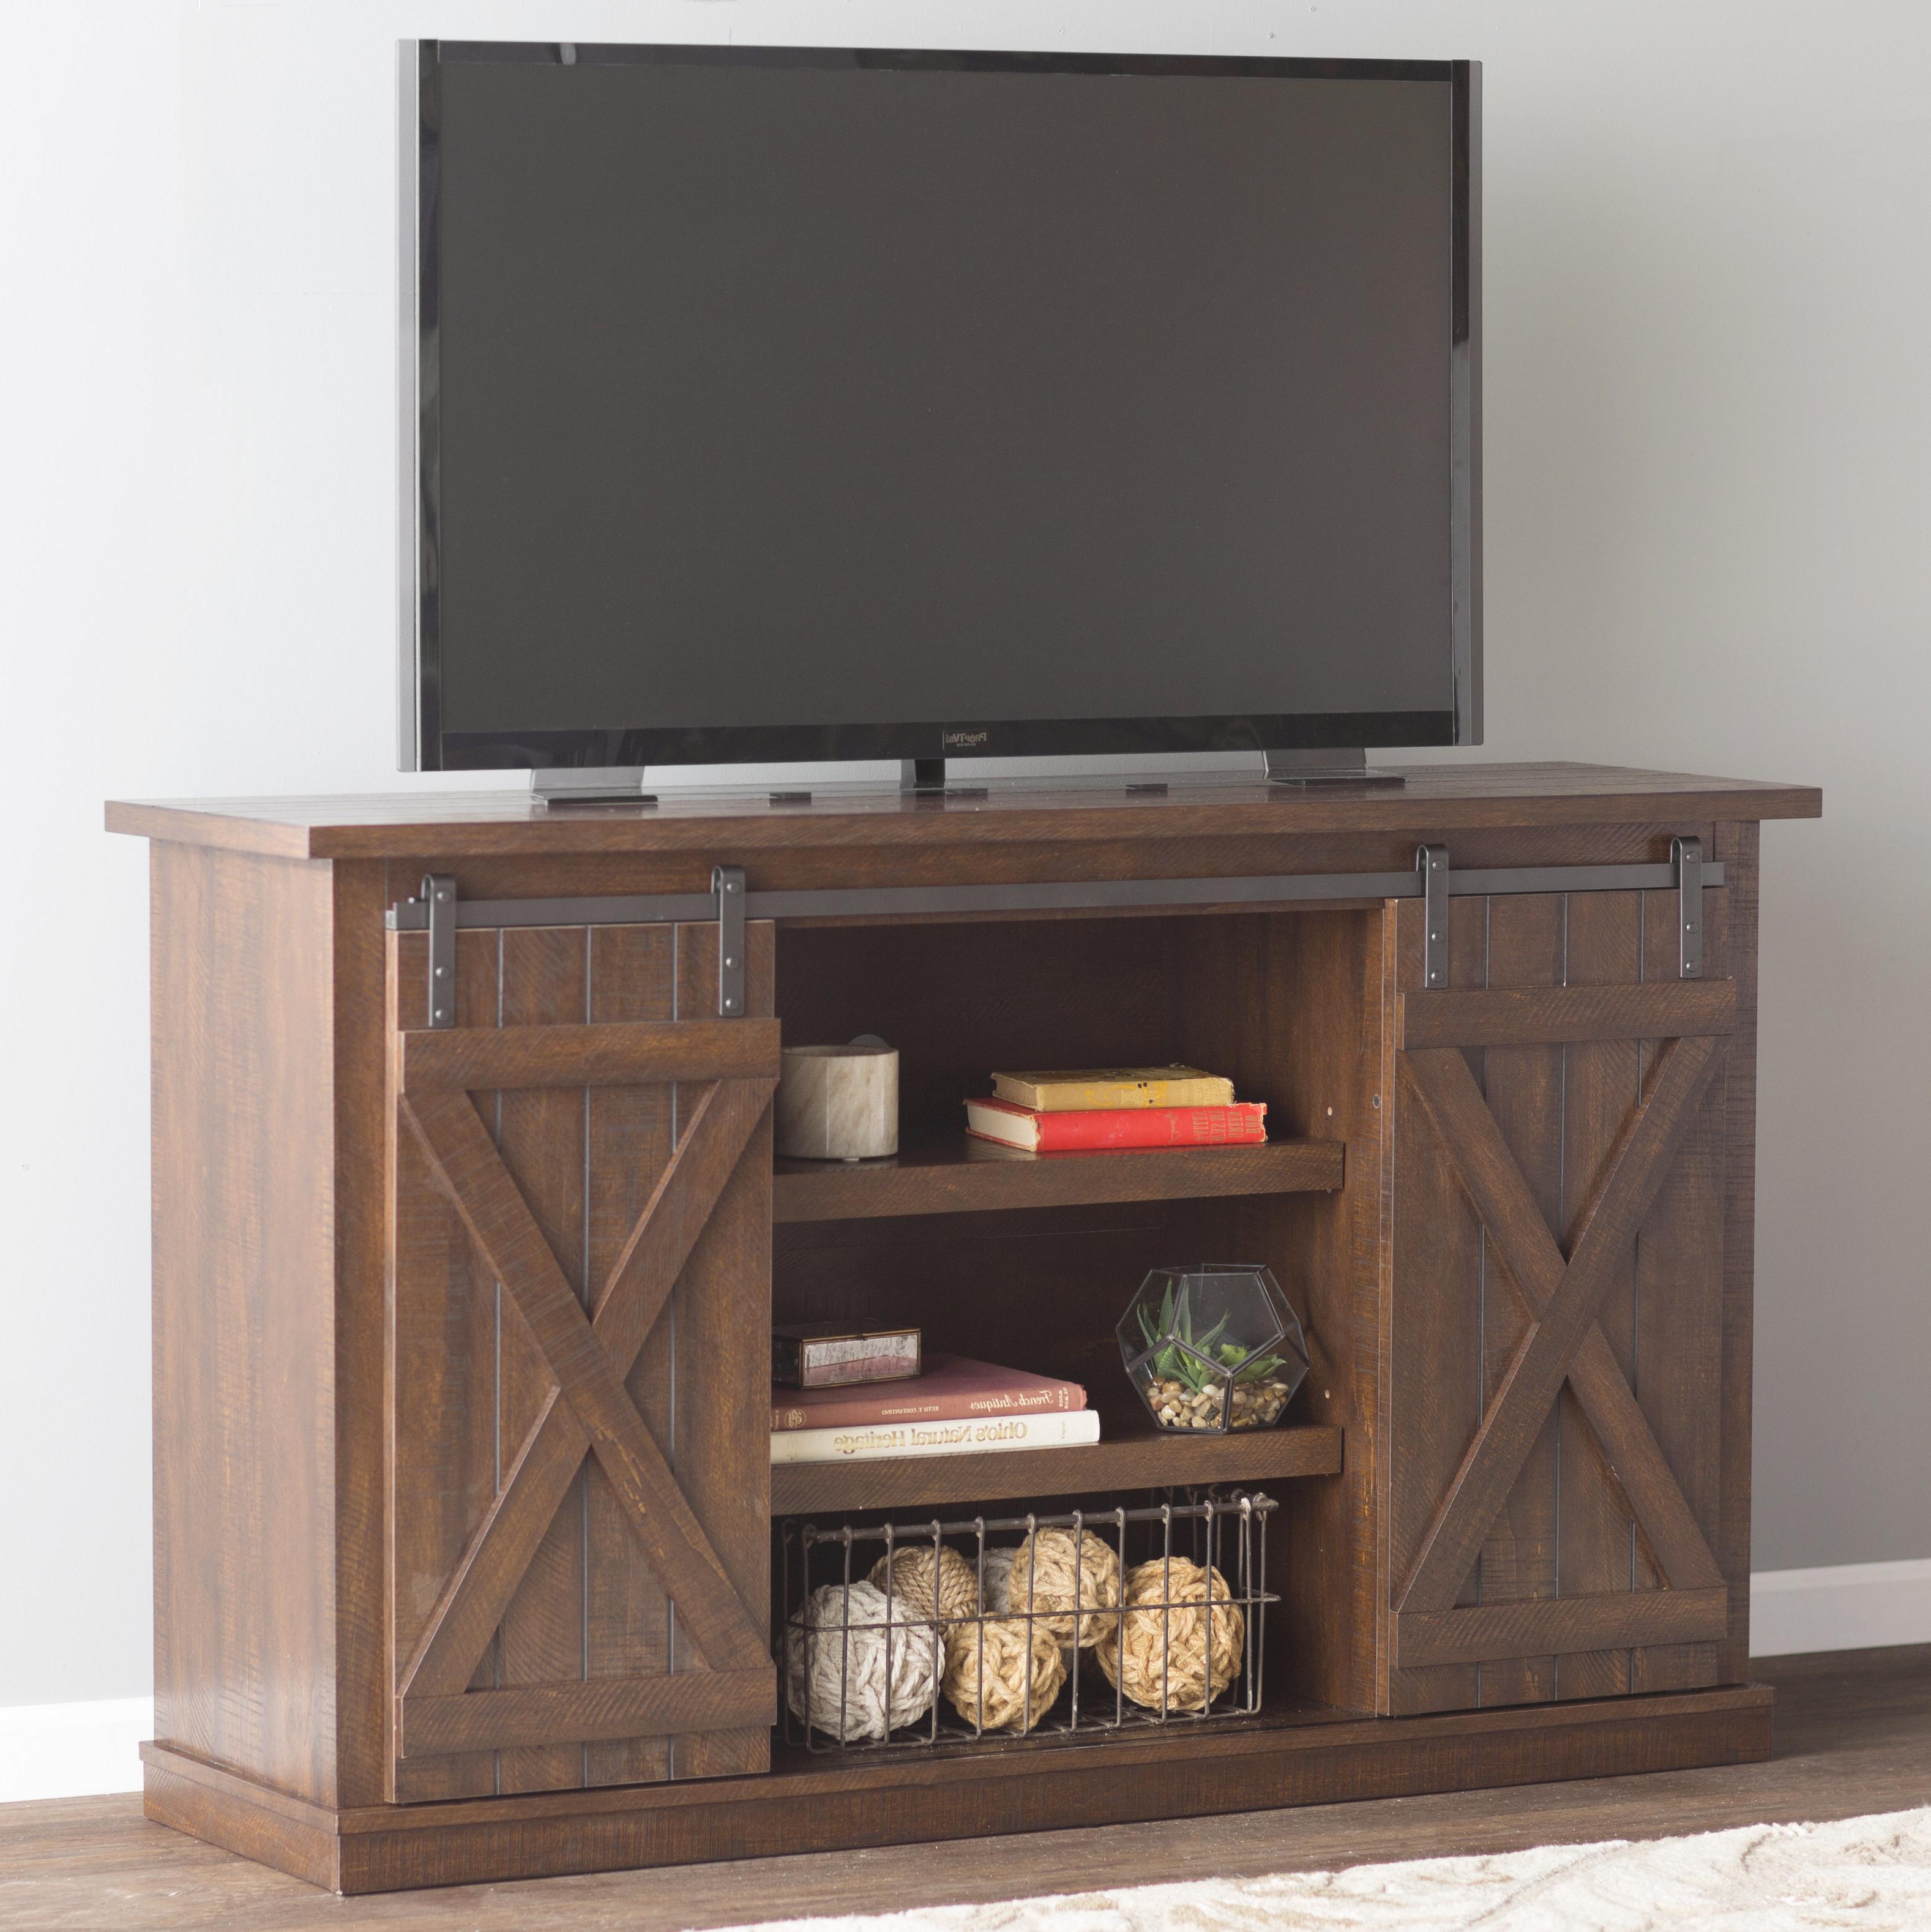 72 Inch Tv Stand | Wayfair Regarding Century Blue 60 Inch Tv Stands (View 1 of 20)